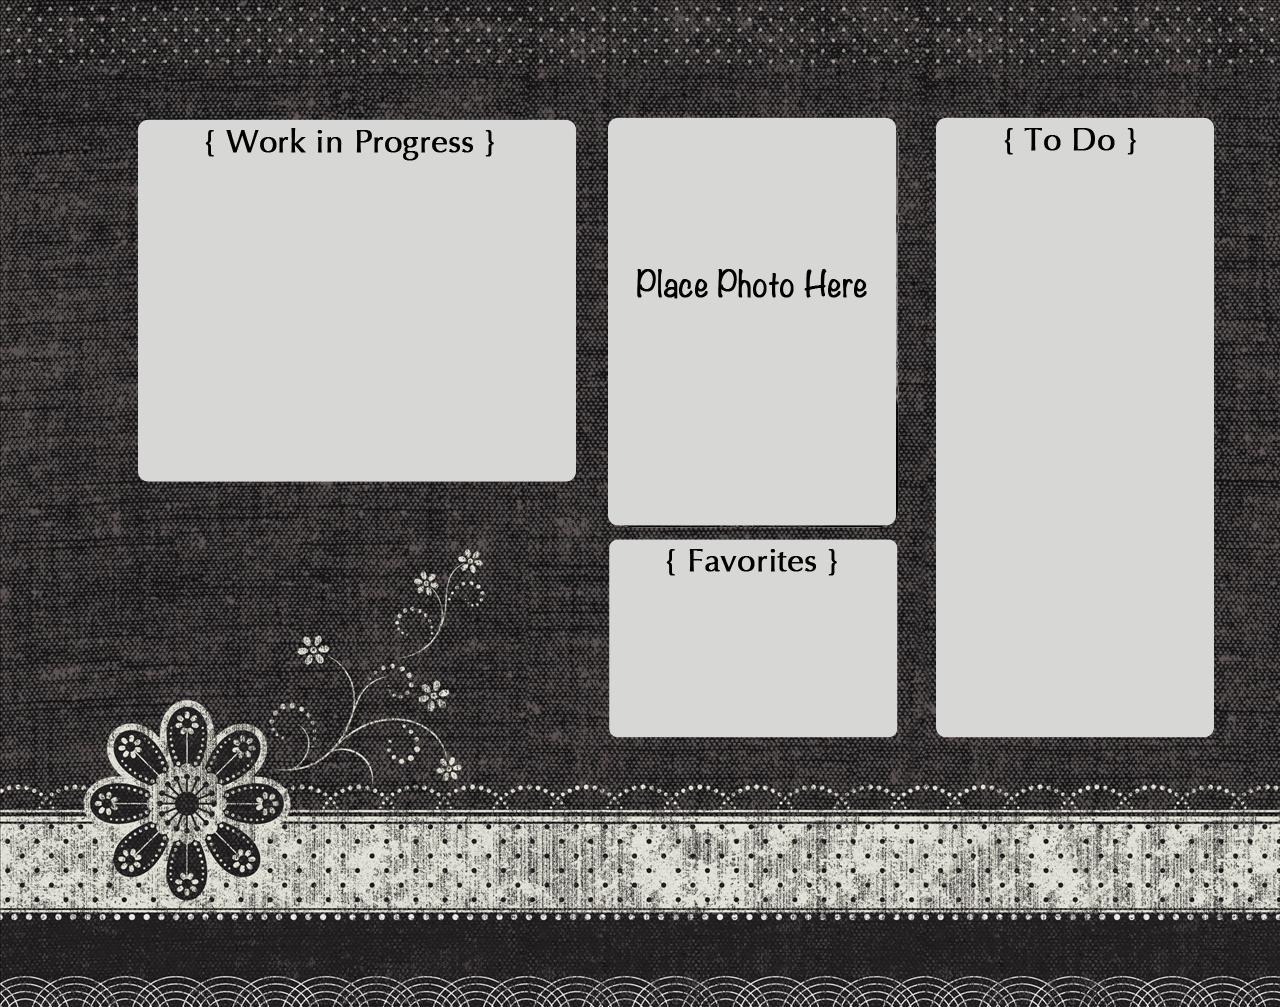 Free Desktop Organizer Wallpaper - WallpaperSafari